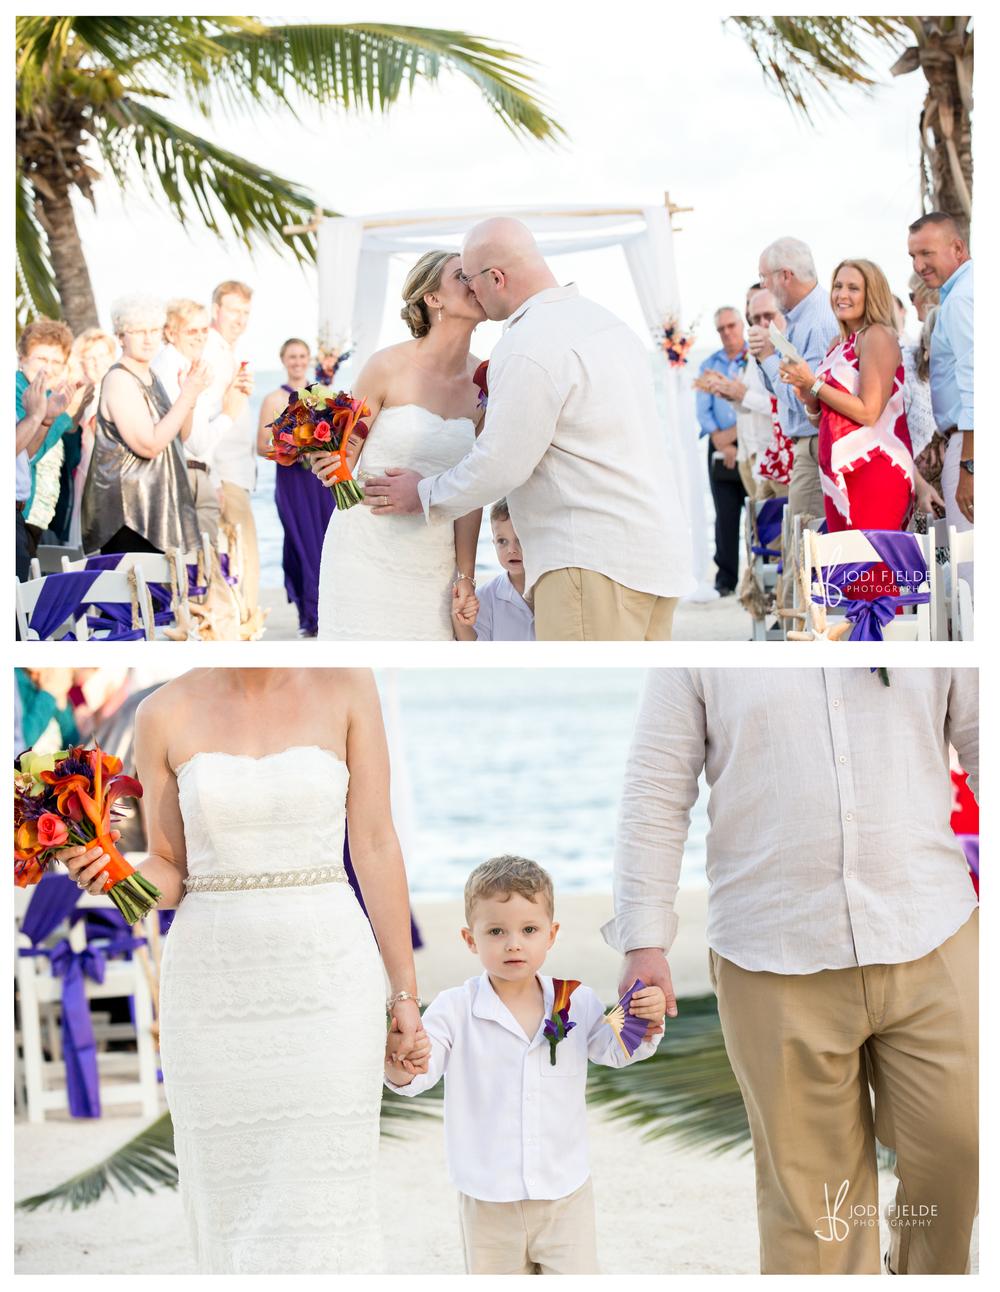 Cocconut_Cove_&_ Marina_ wedding_Kayla_and_Patrick 24.jpg